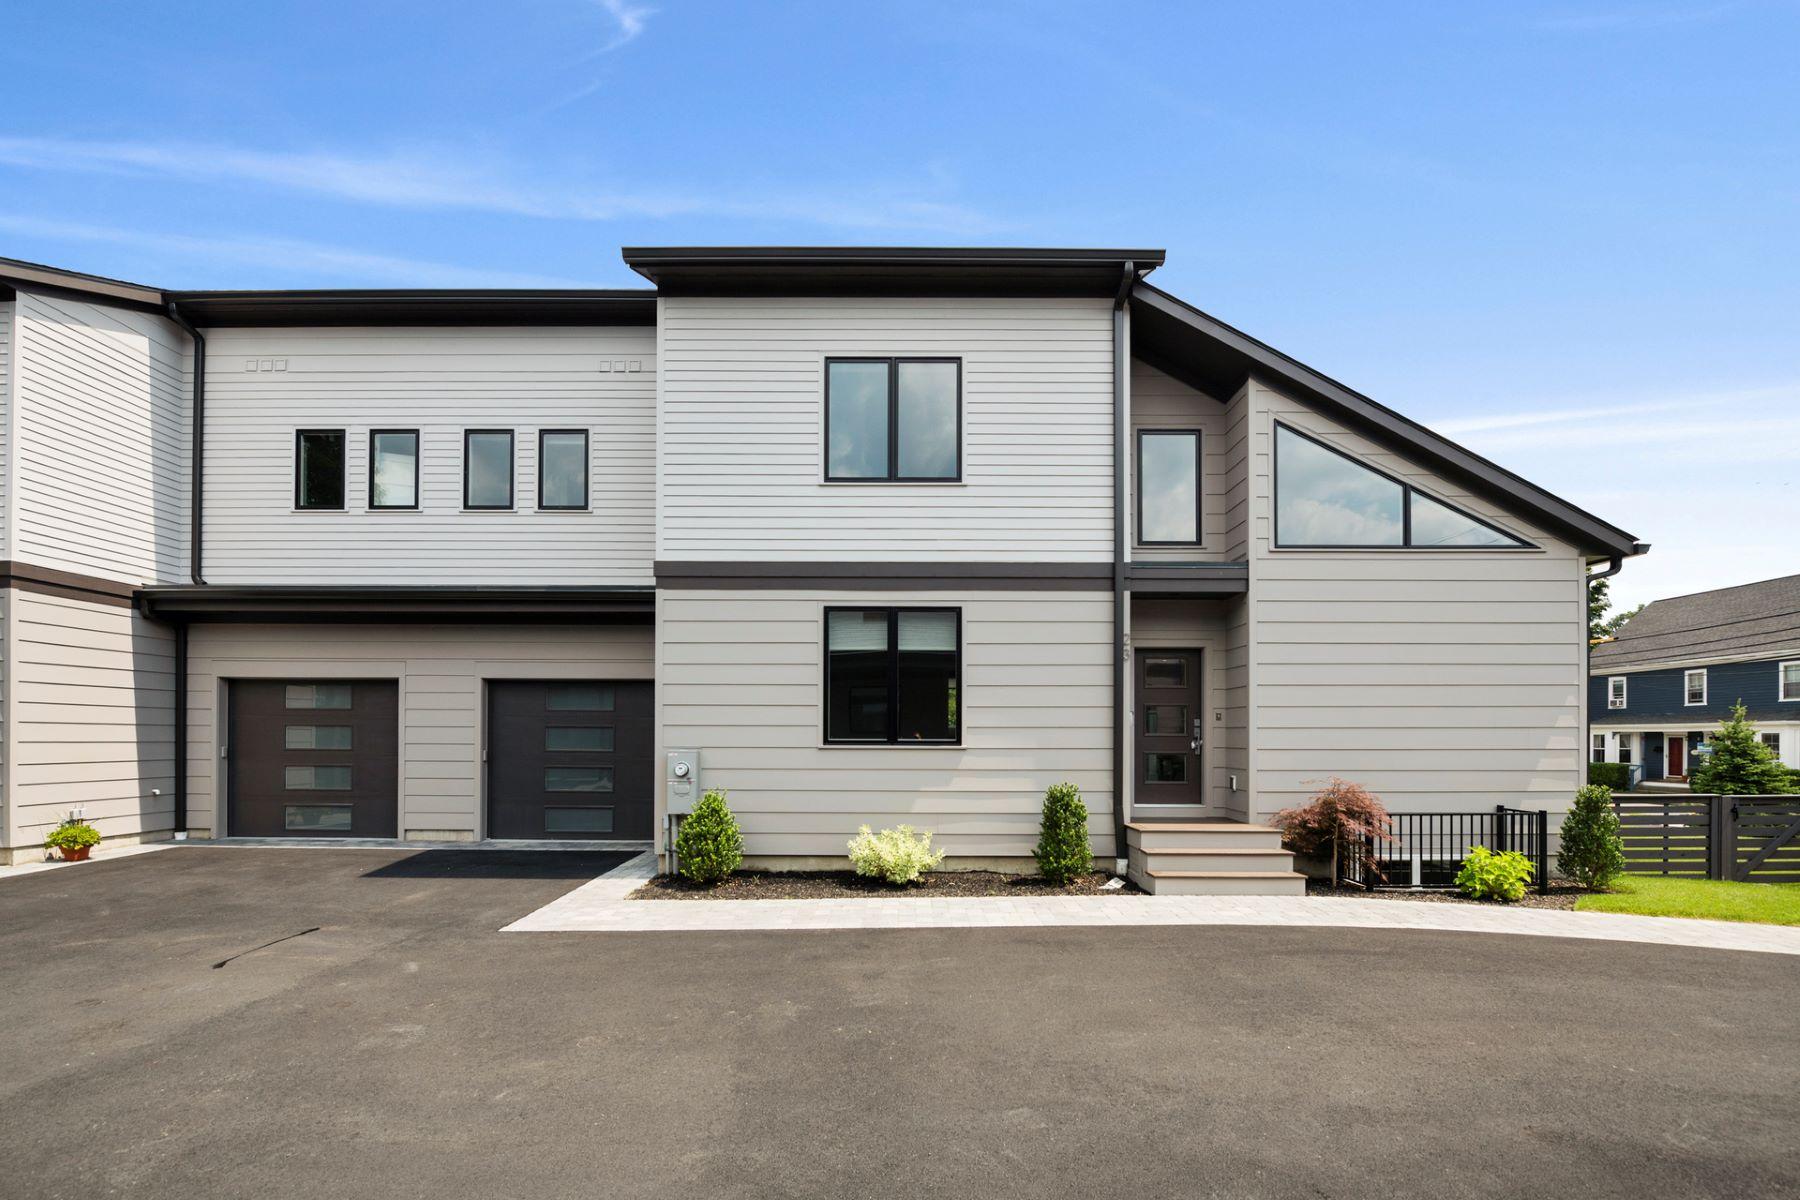 Single Family Homes για την Πώληση στο Newton, Μασαχουσετη 02466 Ηνωμένες Πολιτείες